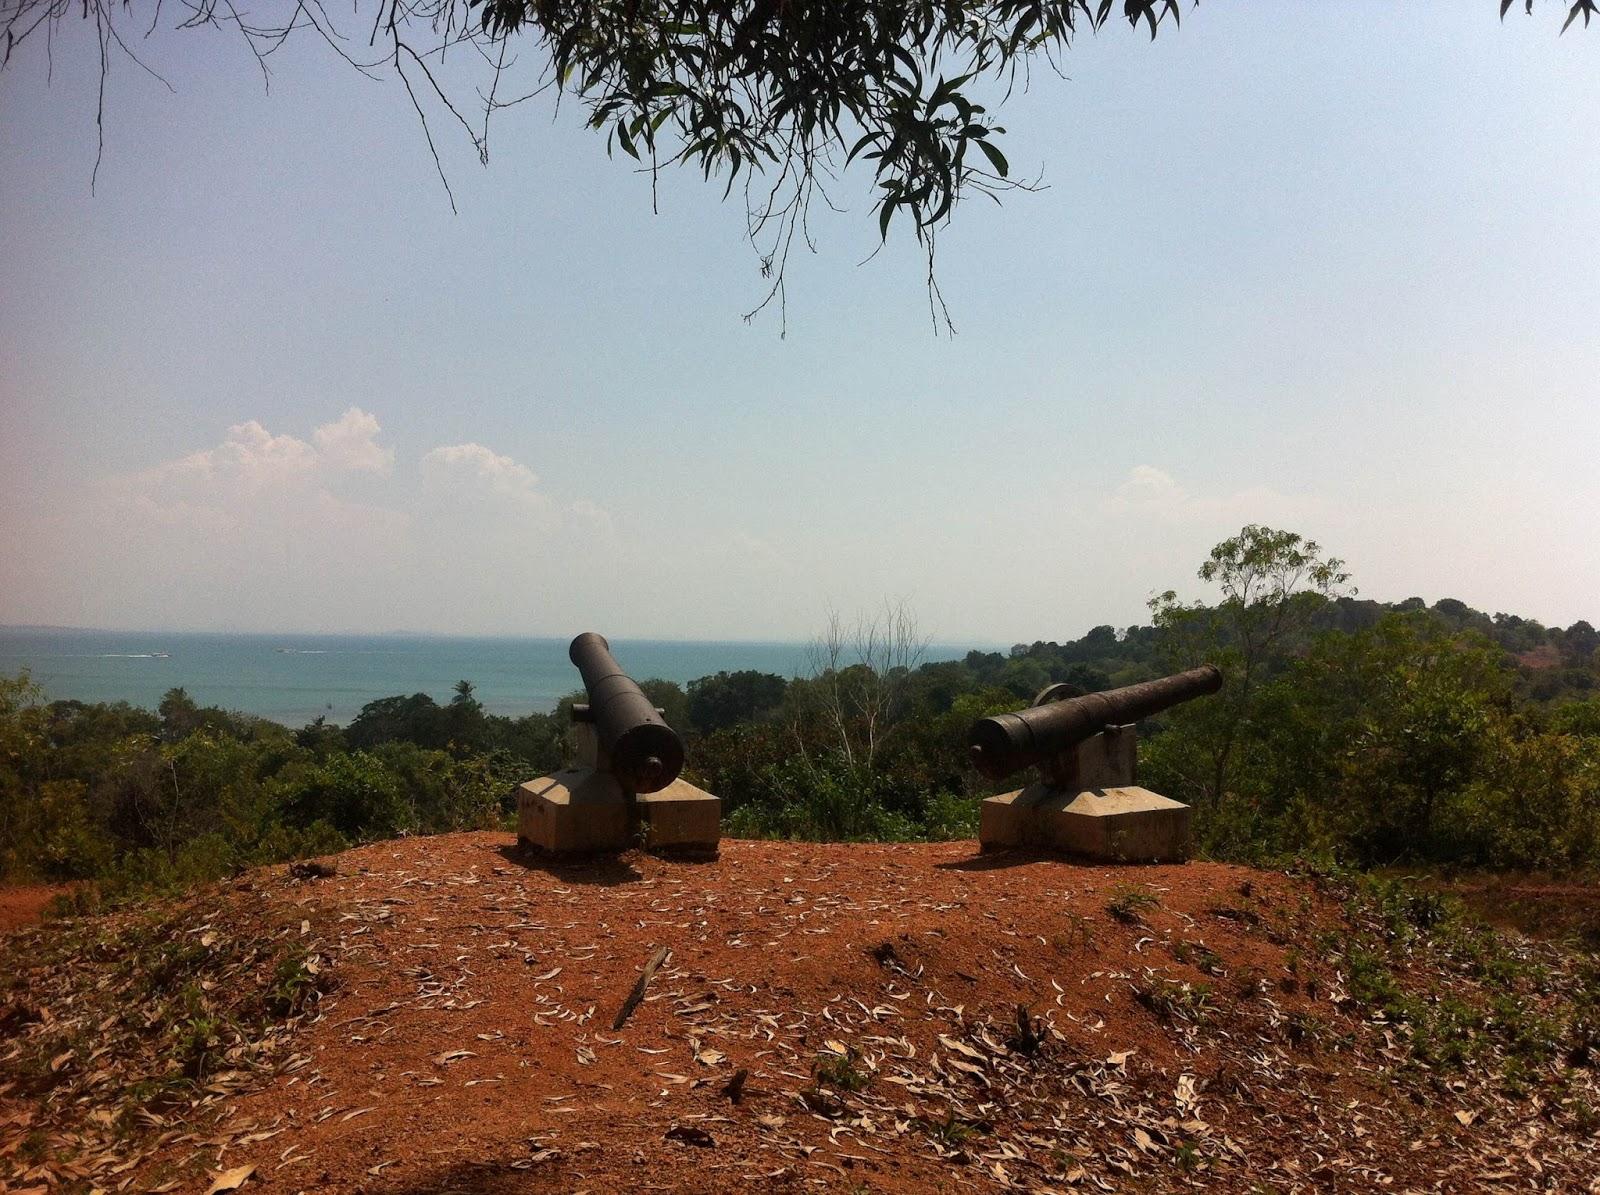 Pesona Historikal Cagar Budaya Pulau Penyengat Inderasakti Atas Benteng Bukit